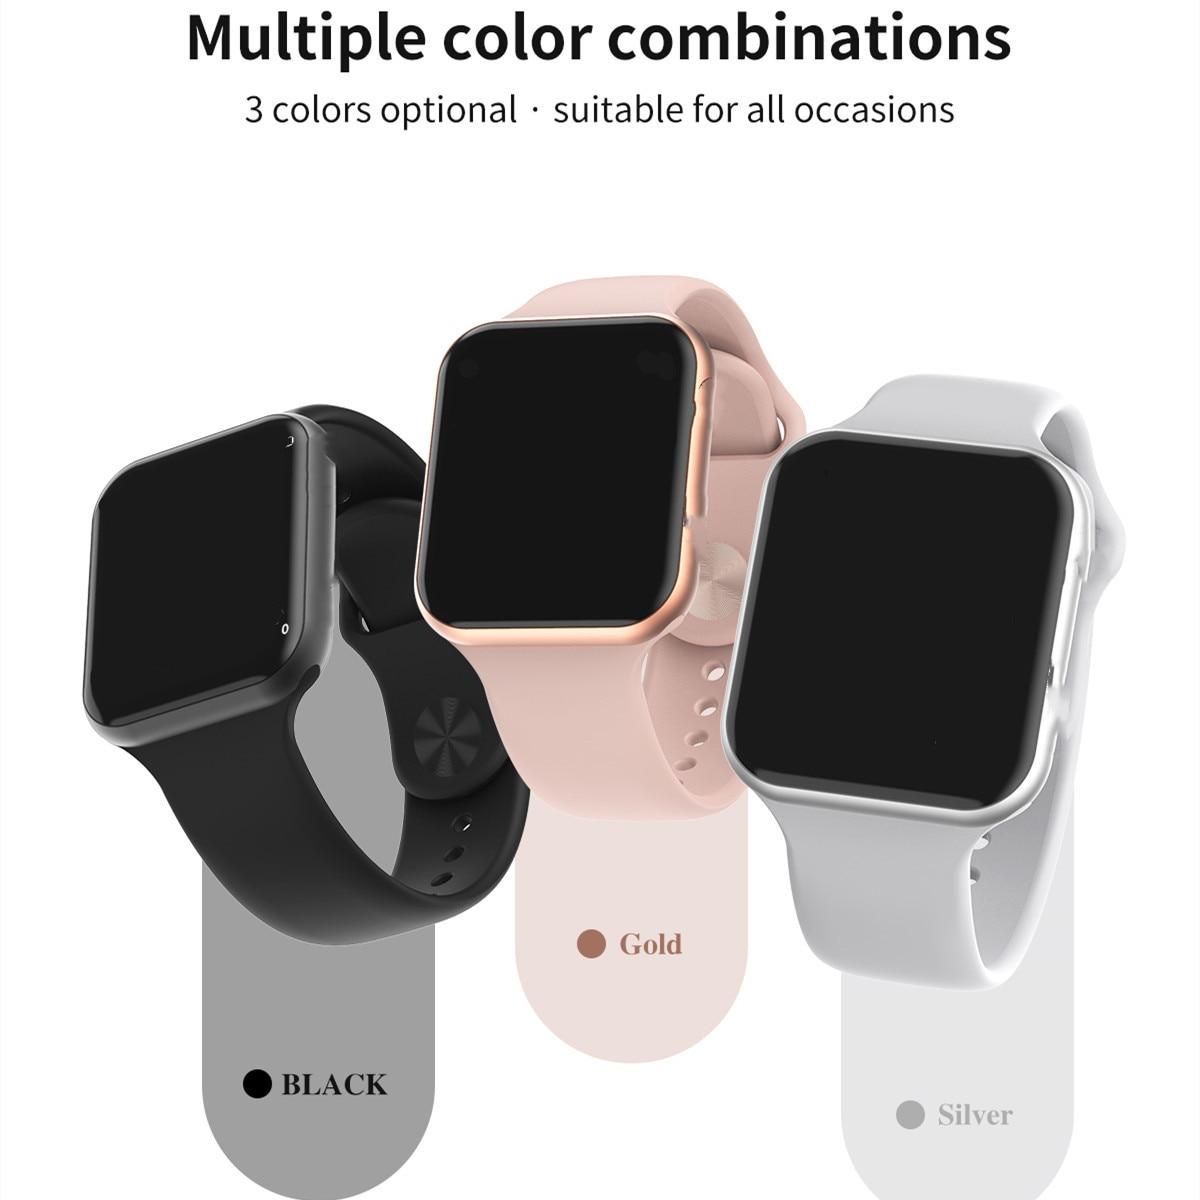 F10 Smartwatch IP68 водонепроницаемый монитор сердечного ритма Bluetooth спортивный фитнес-трекер для мужчин для iPhone xiaomi Androidphone